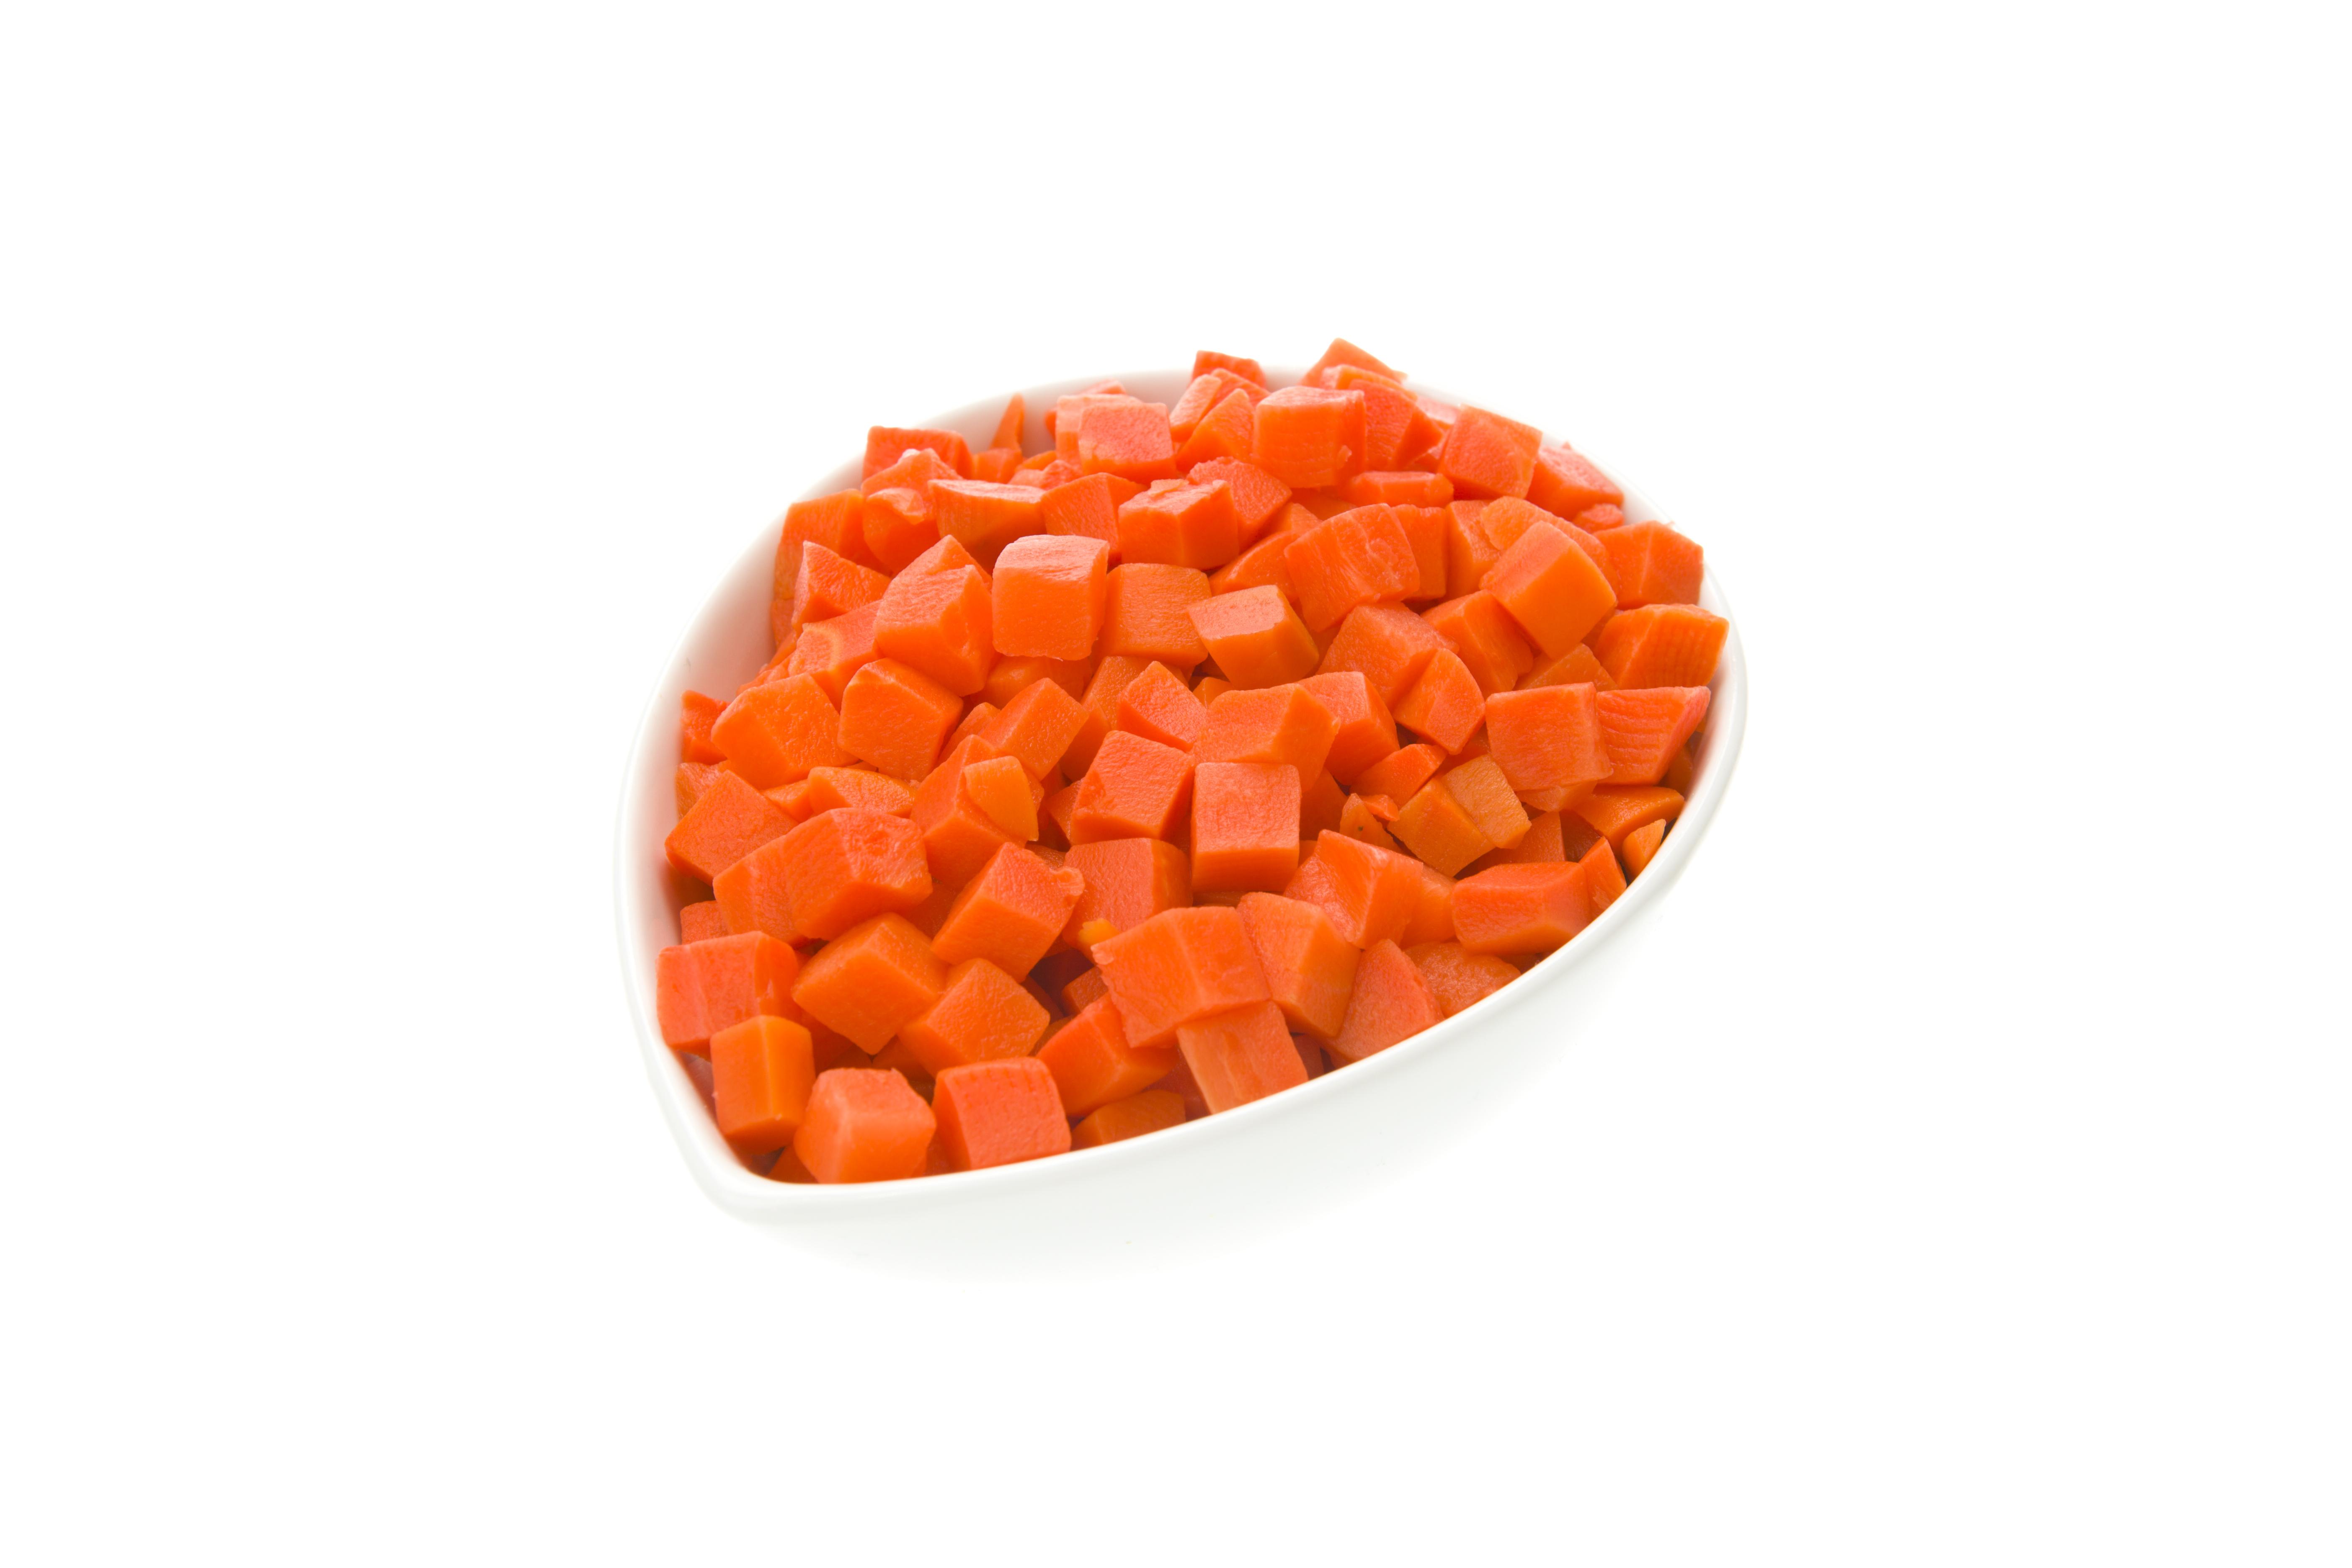 Tifa Quality Karotten gewürfelt 10x10mm 2500 g